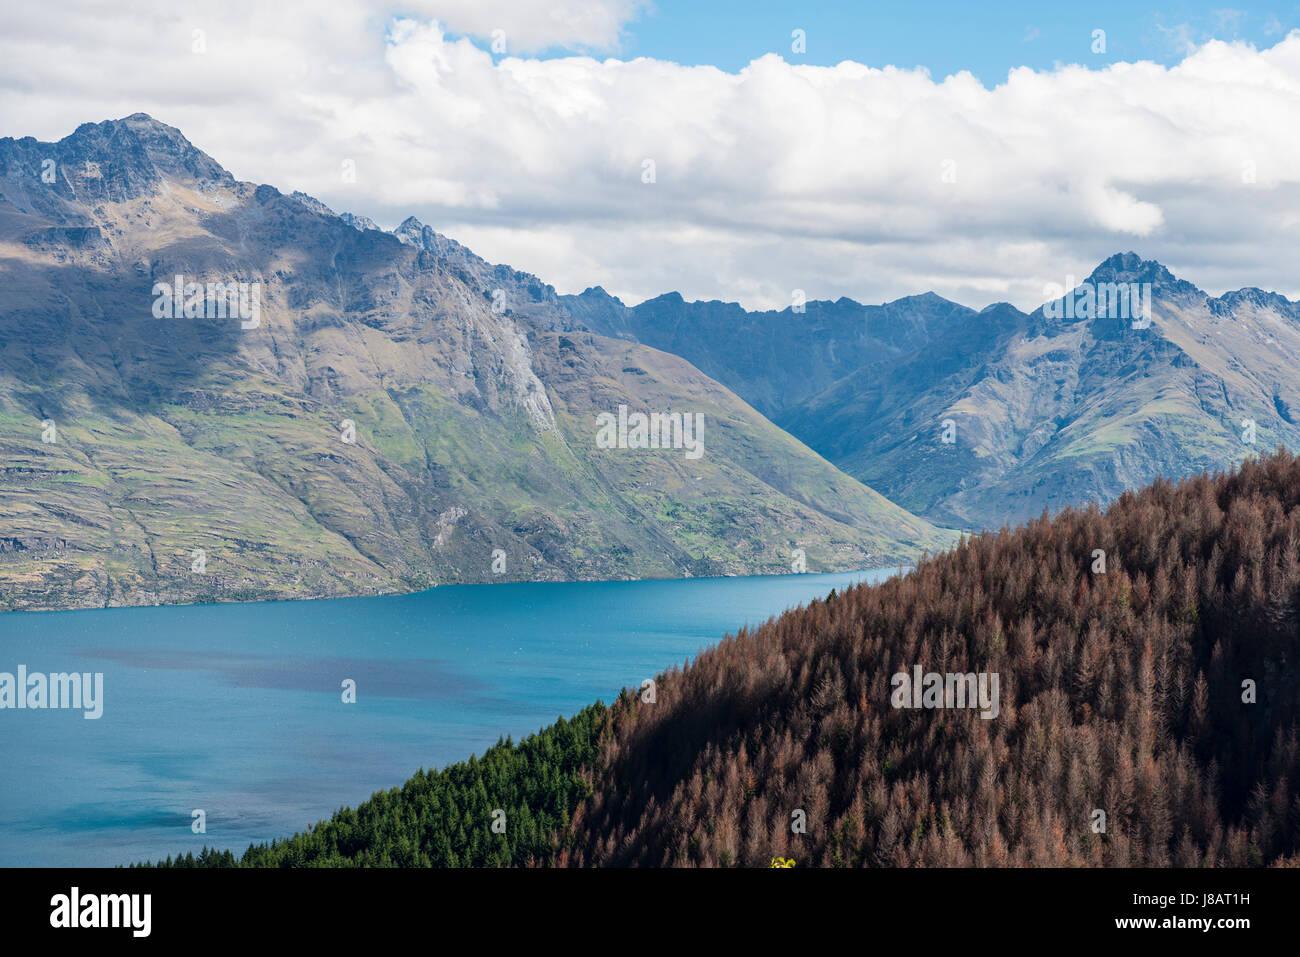 View of Lake Wakatipu, Ben Lomond, Otago, South Island, New Zealand Stock Photo